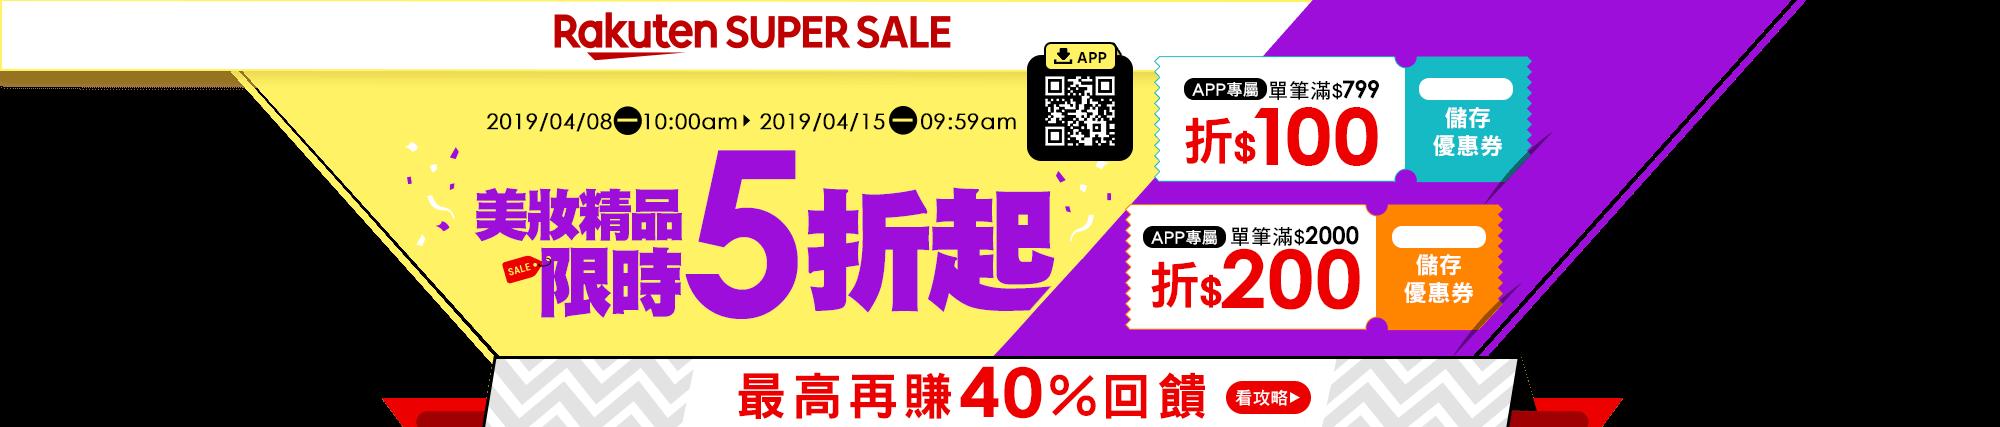 SUPER SALE超級特賣週:美妝精品限時5折起,最高再賺40%點數回饋